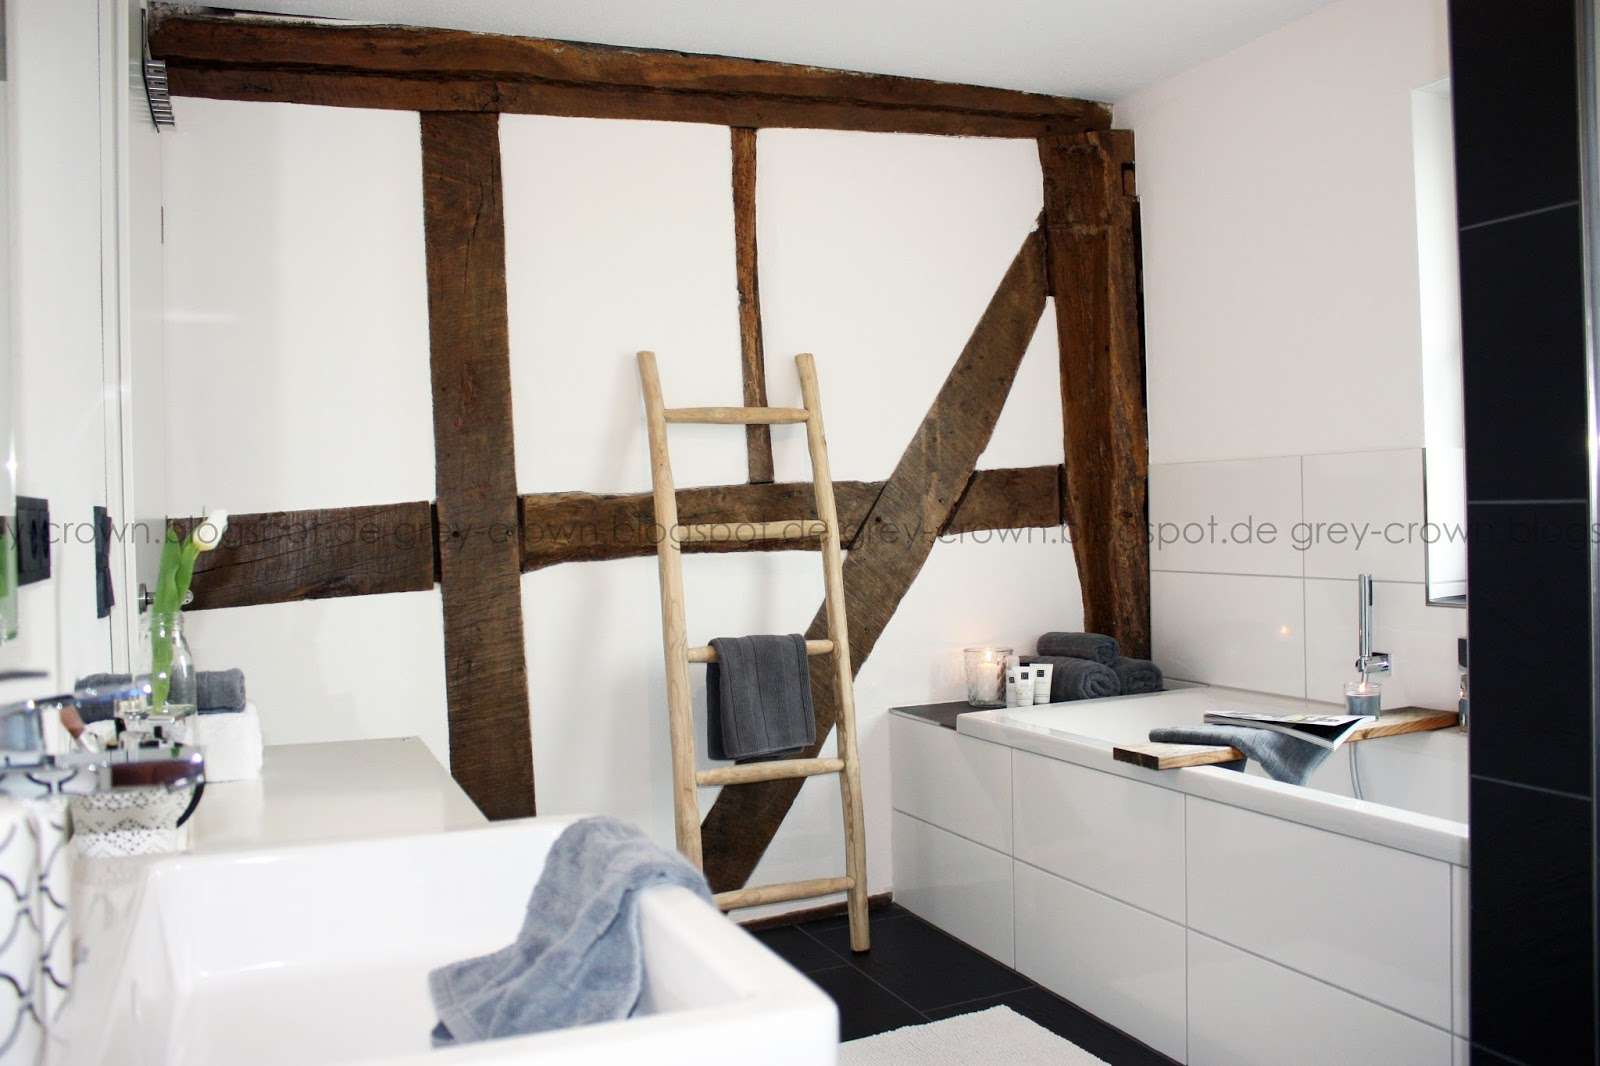 grey crown badezimmer vorher nachher. Black Bedroom Furniture Sets. Home Design Ideas